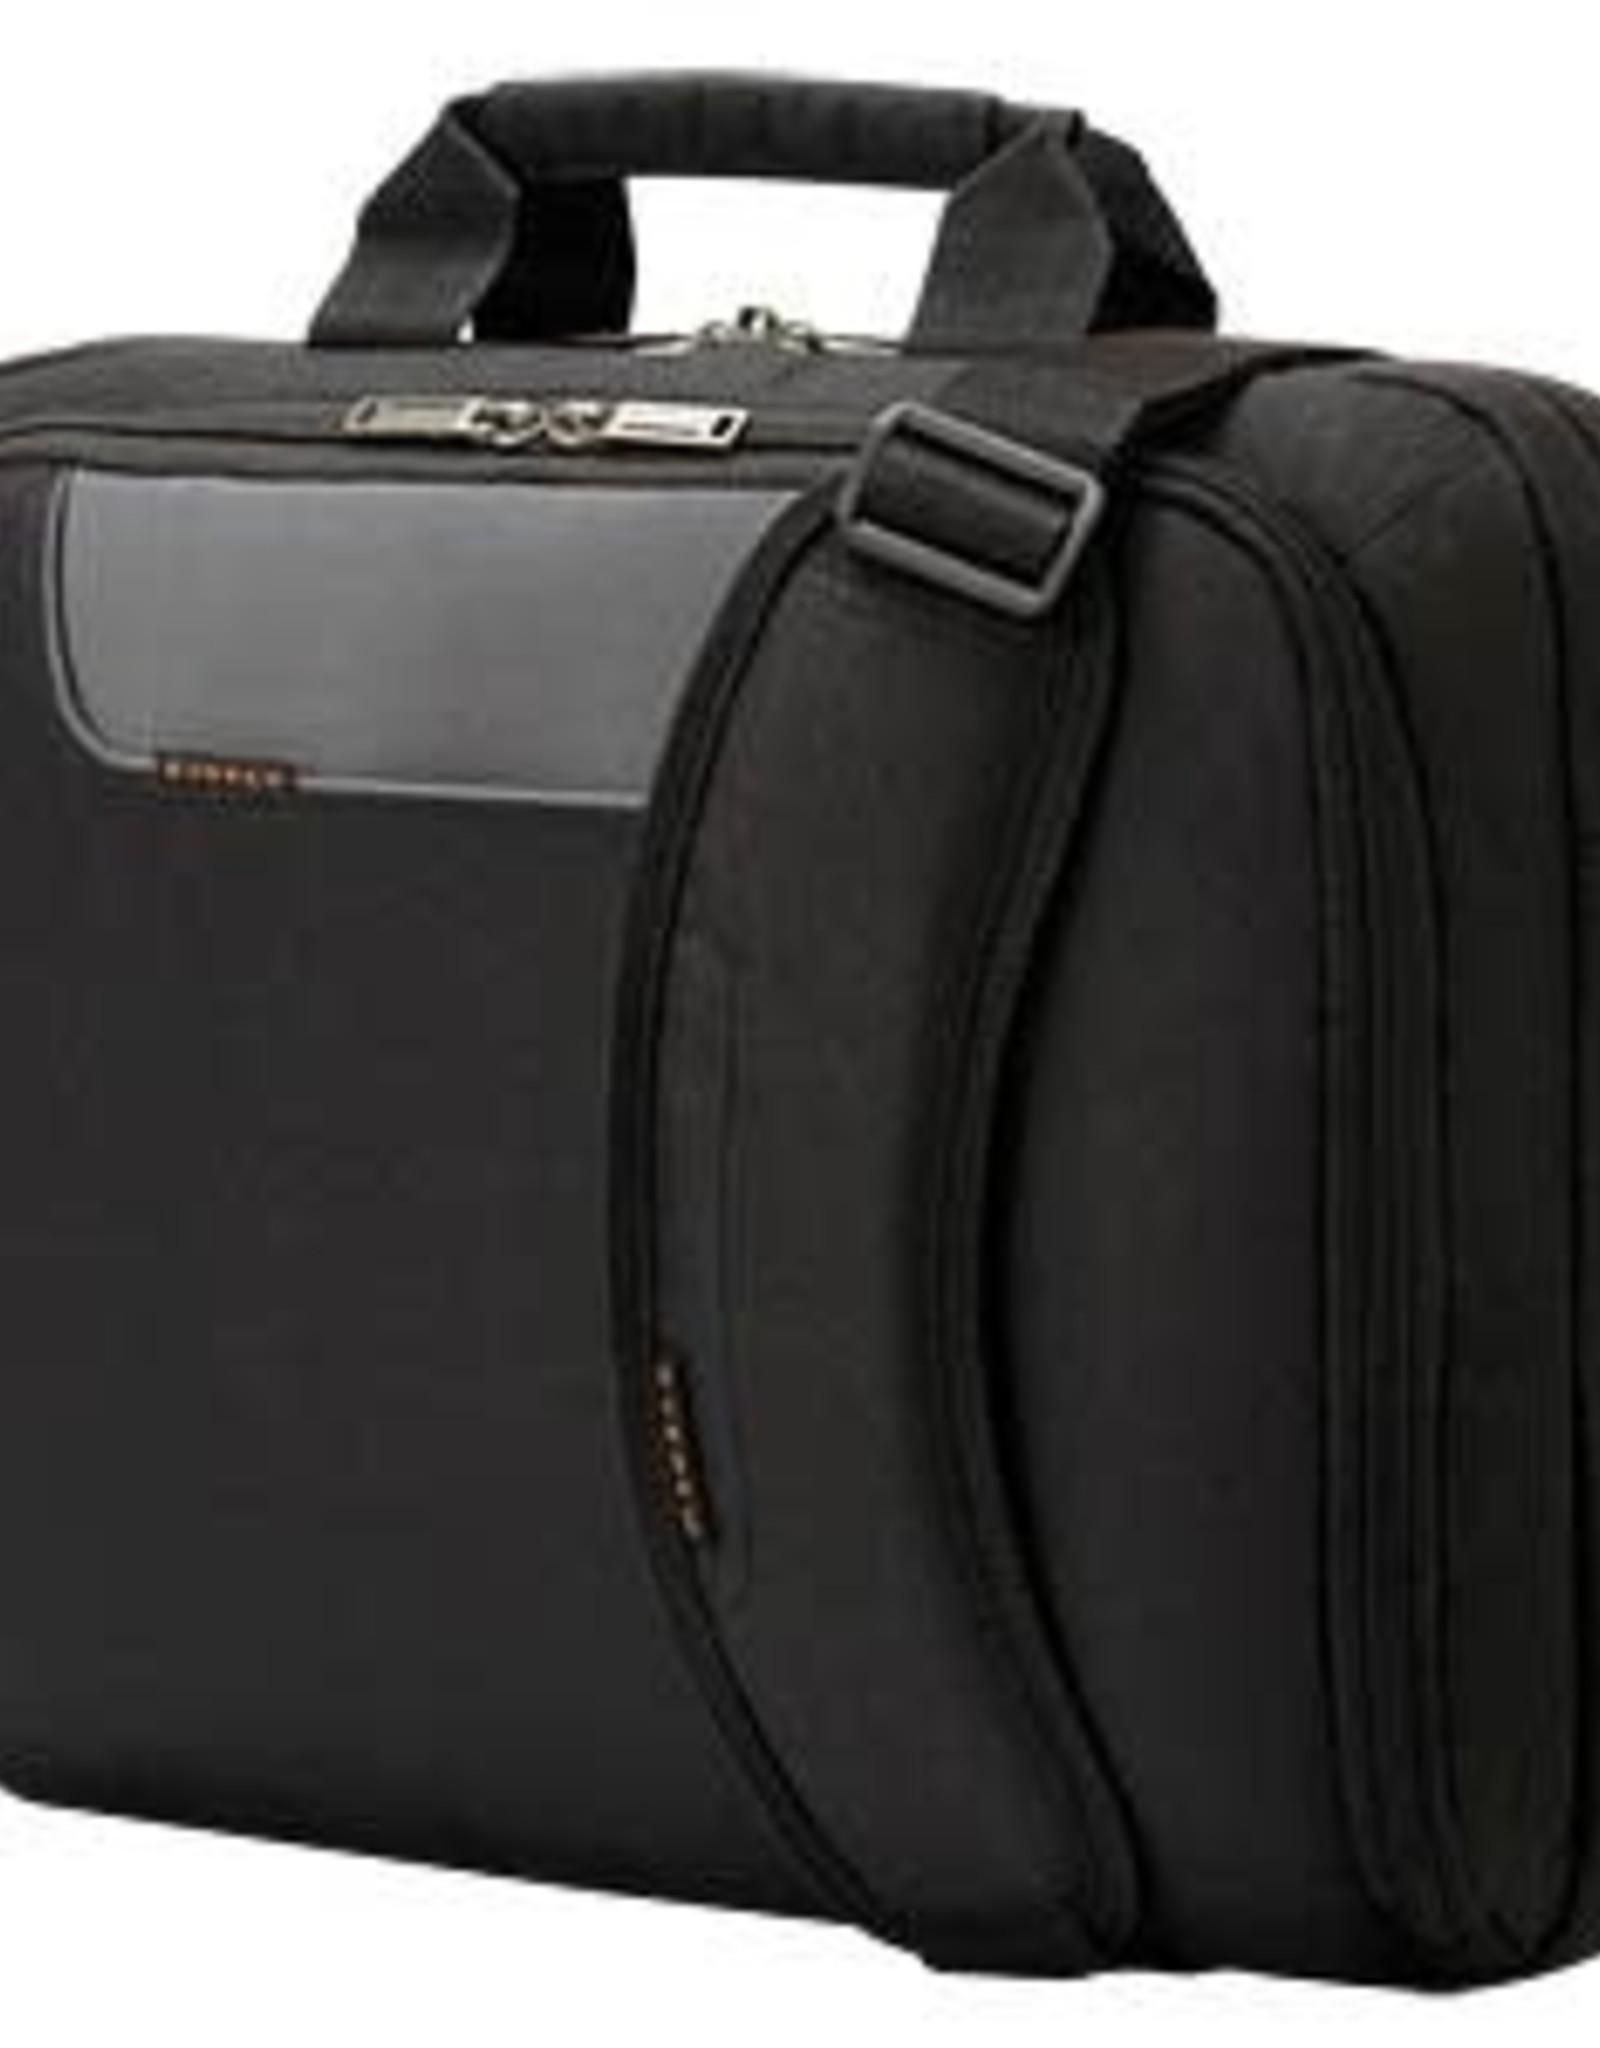 Everki Advance Bag 14.1'' Black 112-9324